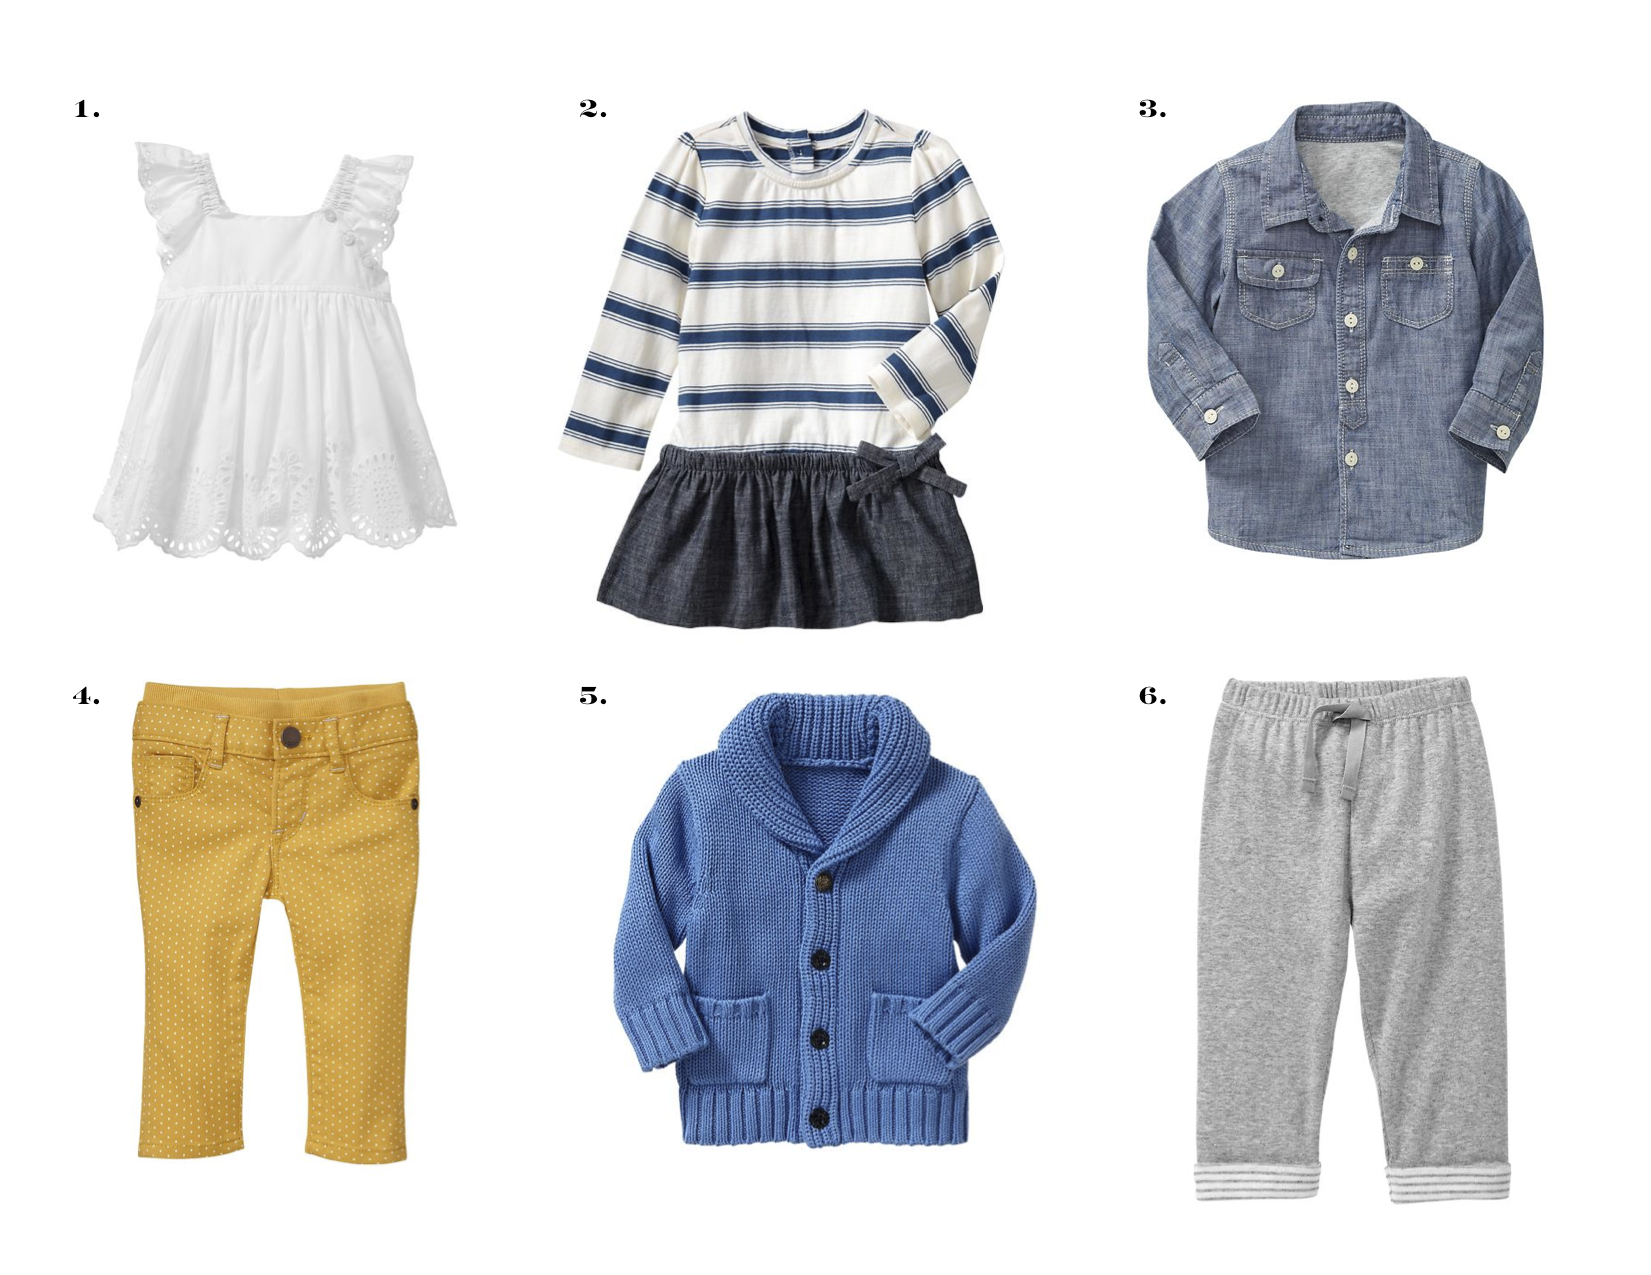 Adorable Baby Clothes for Winter Spring 2013